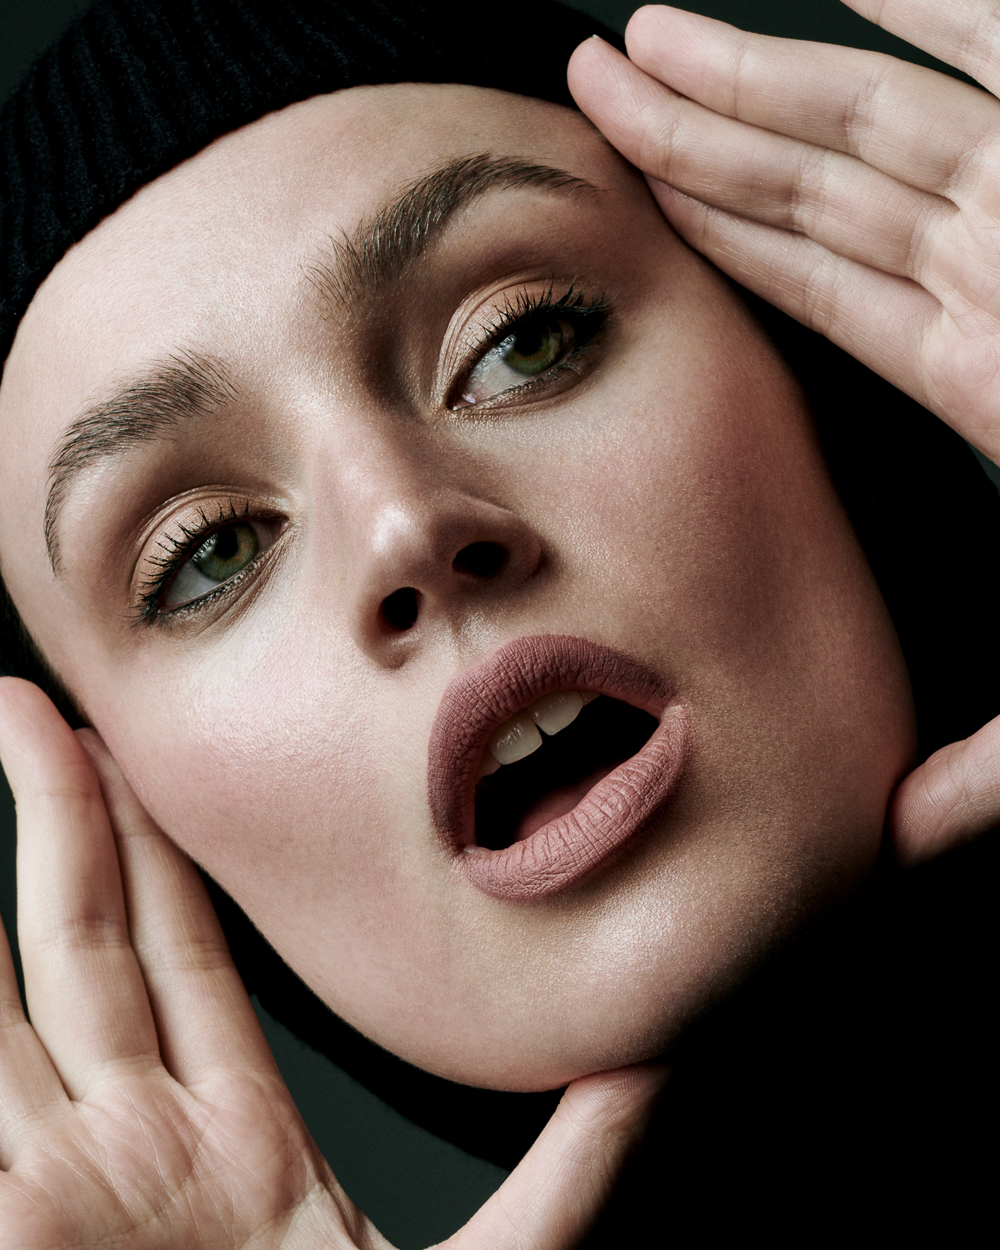 Paulina Wesolowska Exclusively for Fashion Editorials with Maddie Kulicka | Fashion Editorials Beauty Shot Beauty Editorial #closeup #beautyshot #beautyeditorial #fashionphotography #beautyphotography #fashioneditorials